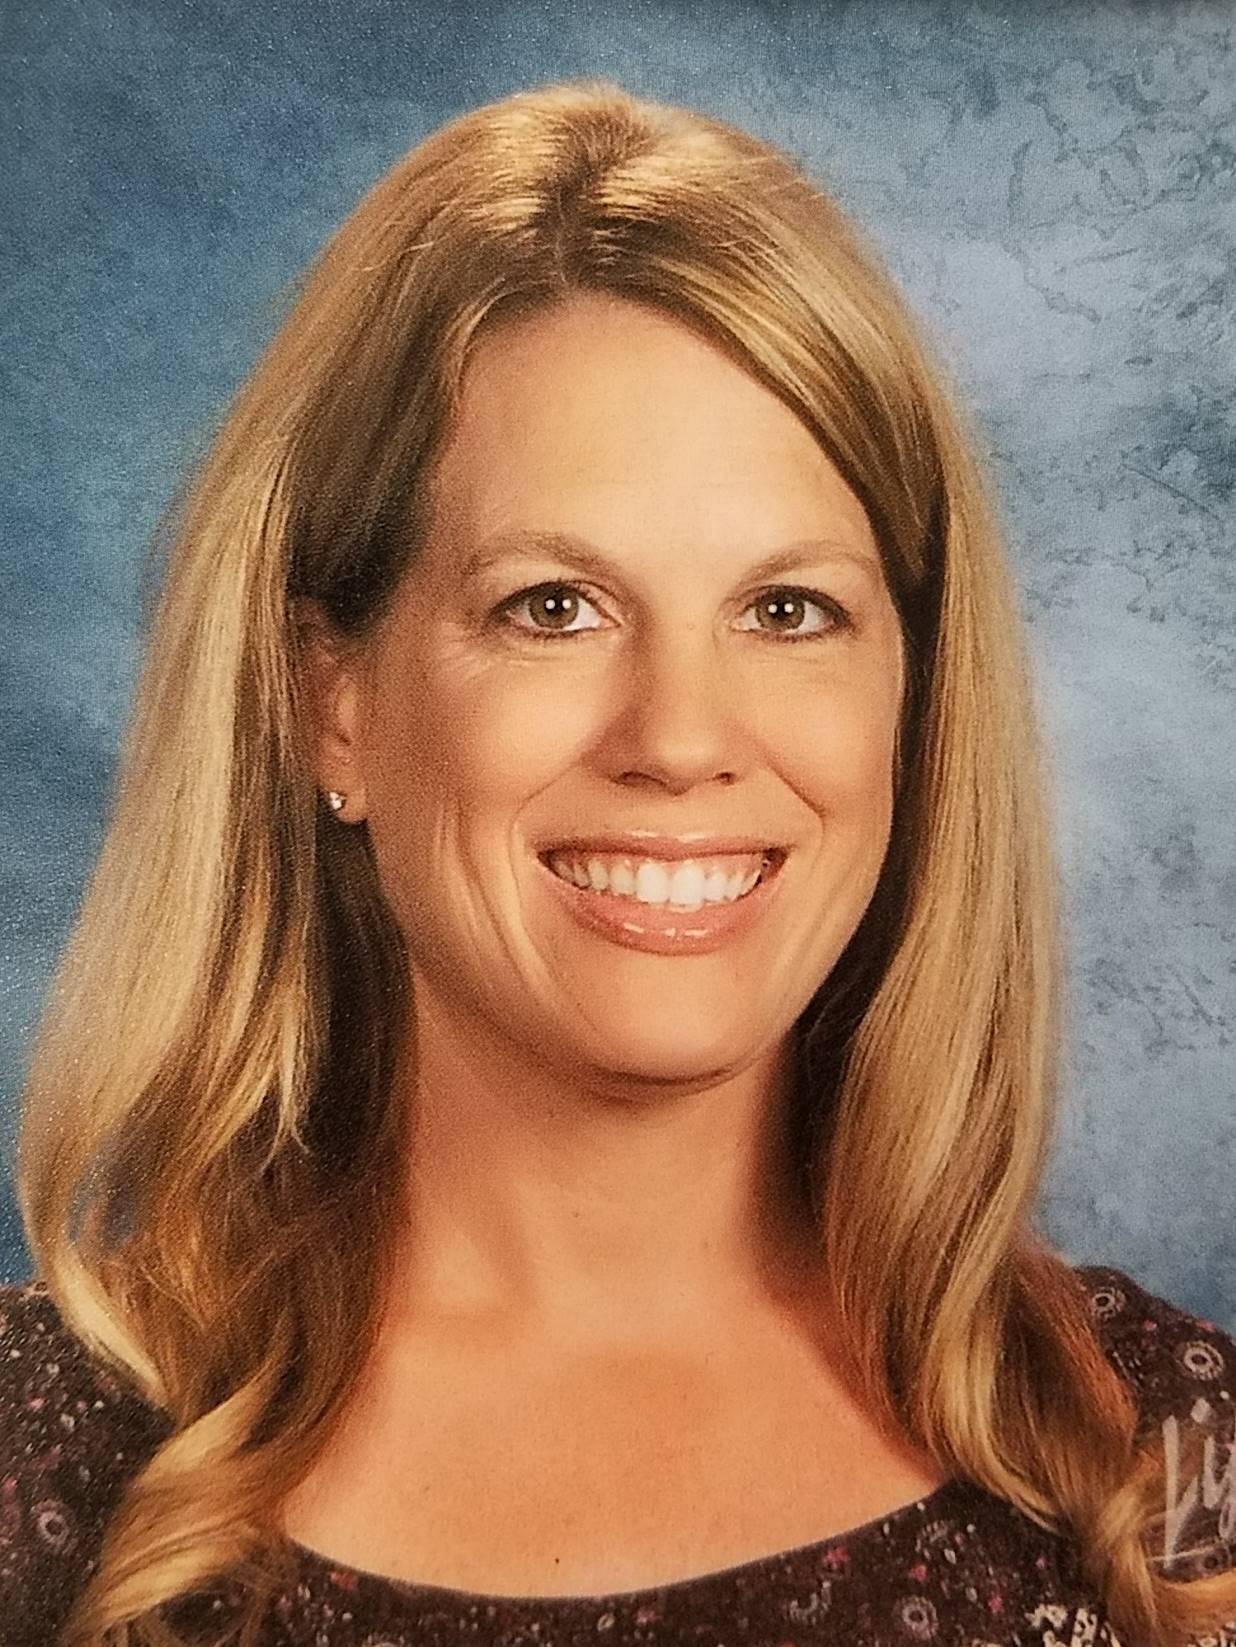 Mrs. Heidi Fortney